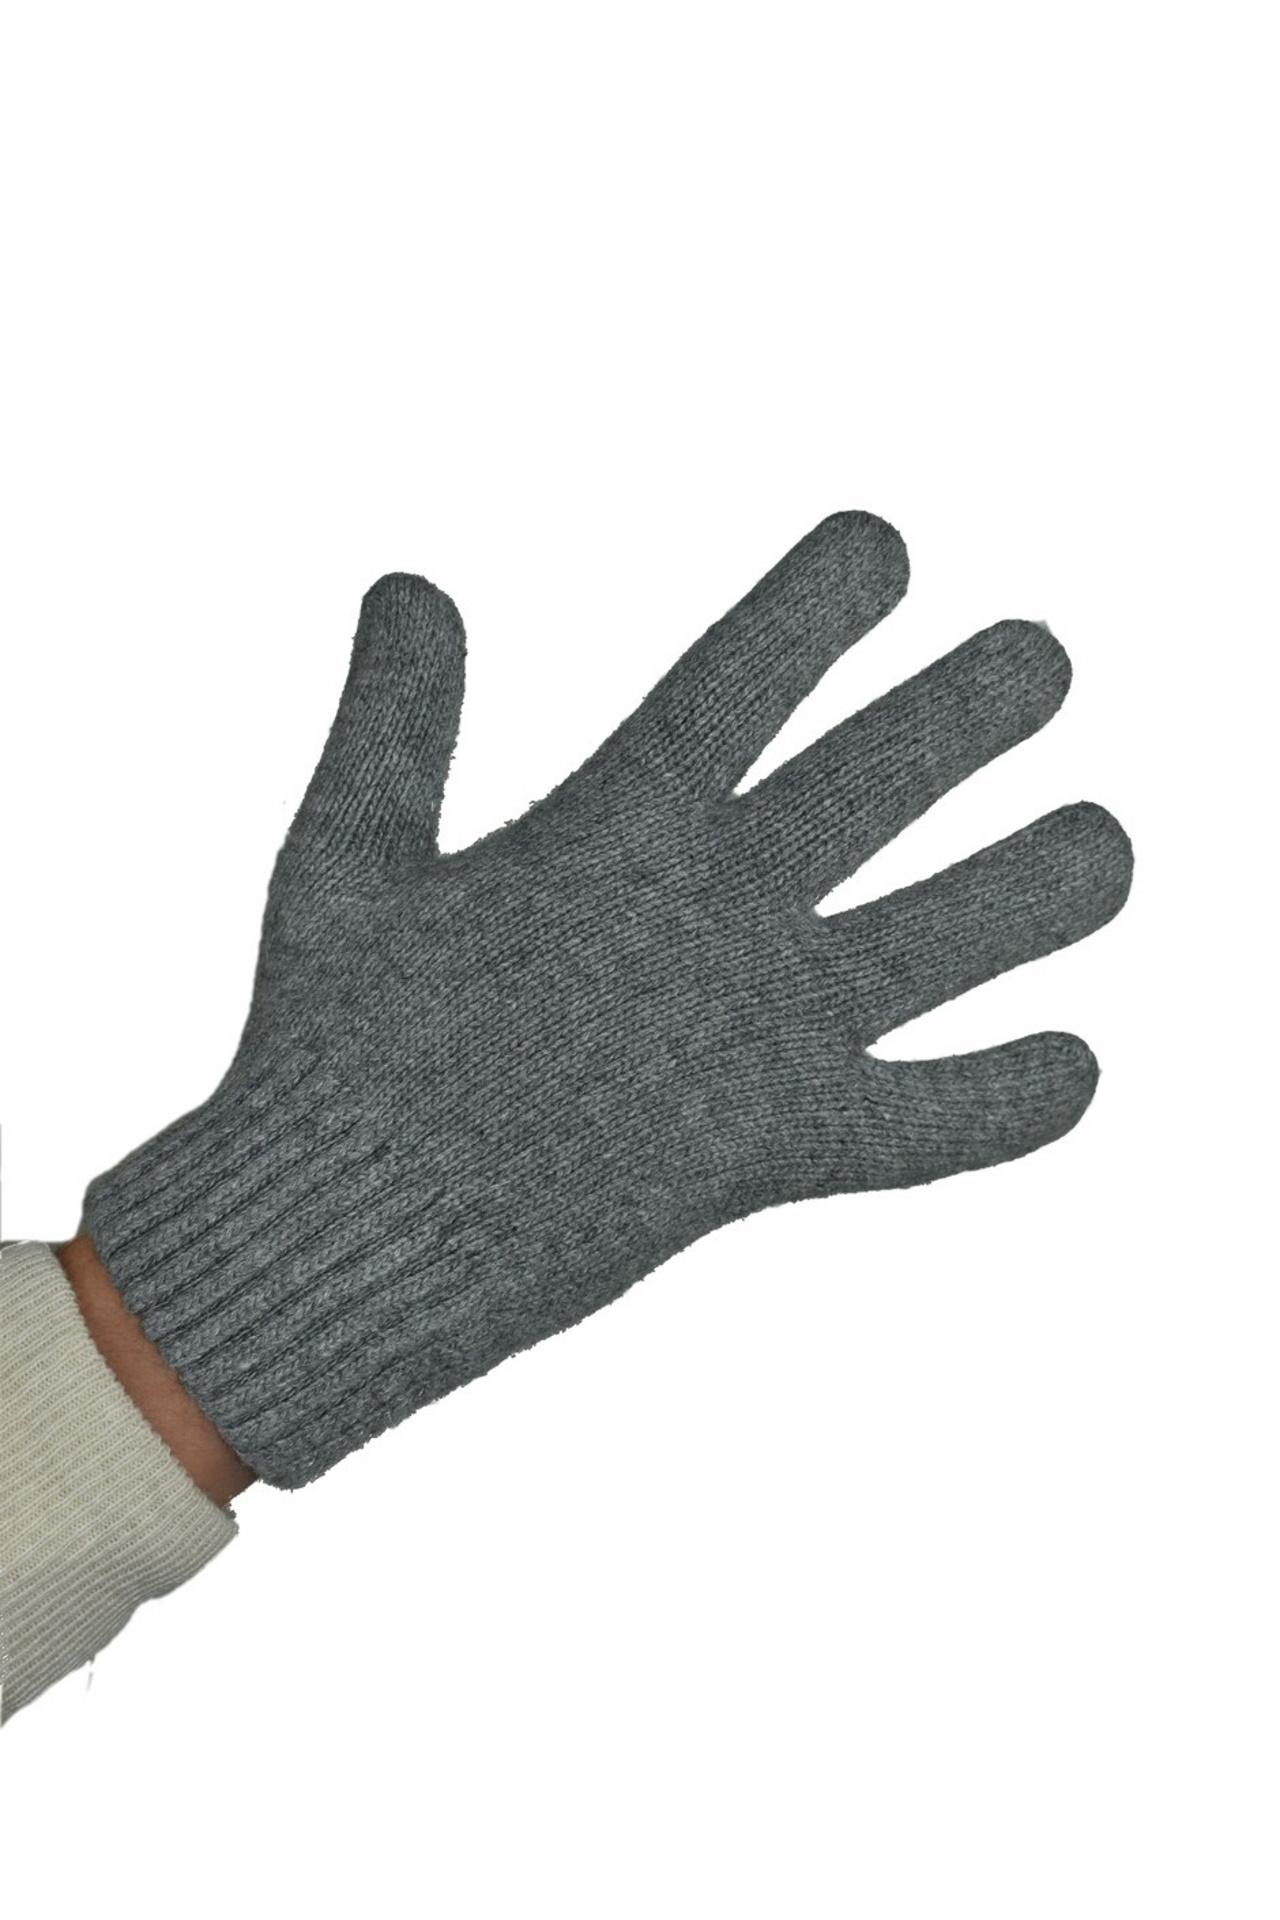 GLOVESMIXDARIO PERLA GUANTI UOMO IN CASHMERE E LANA 2 1stAmerican guanti in lana e cashmere da uomo Made in Italy - caldi guanti invernali